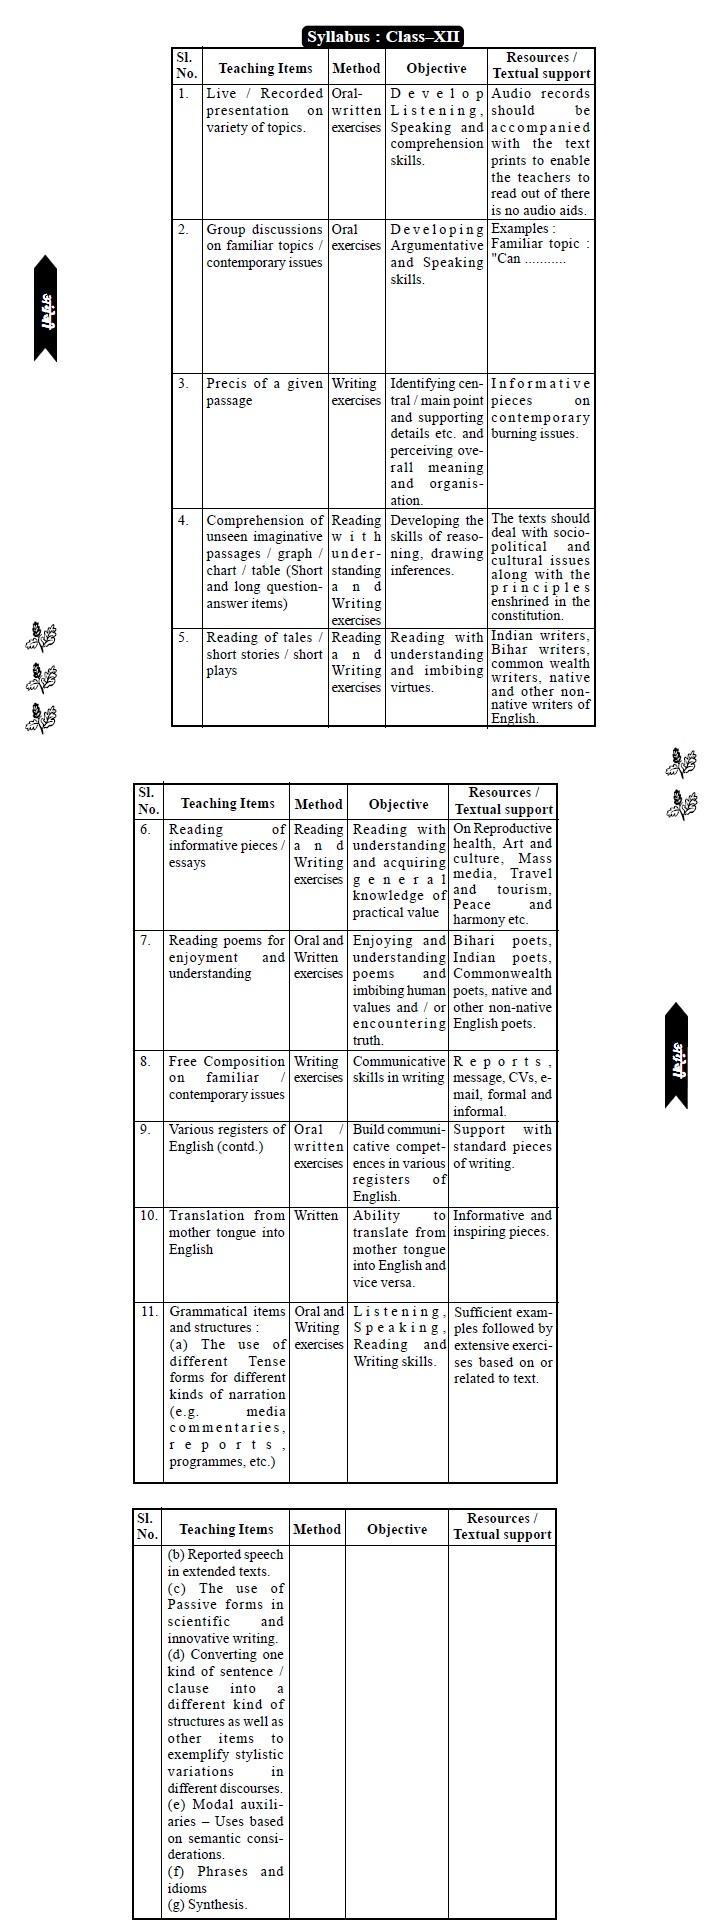 Bihar Board Senior Secondary Syllabus - Lit./Lang.